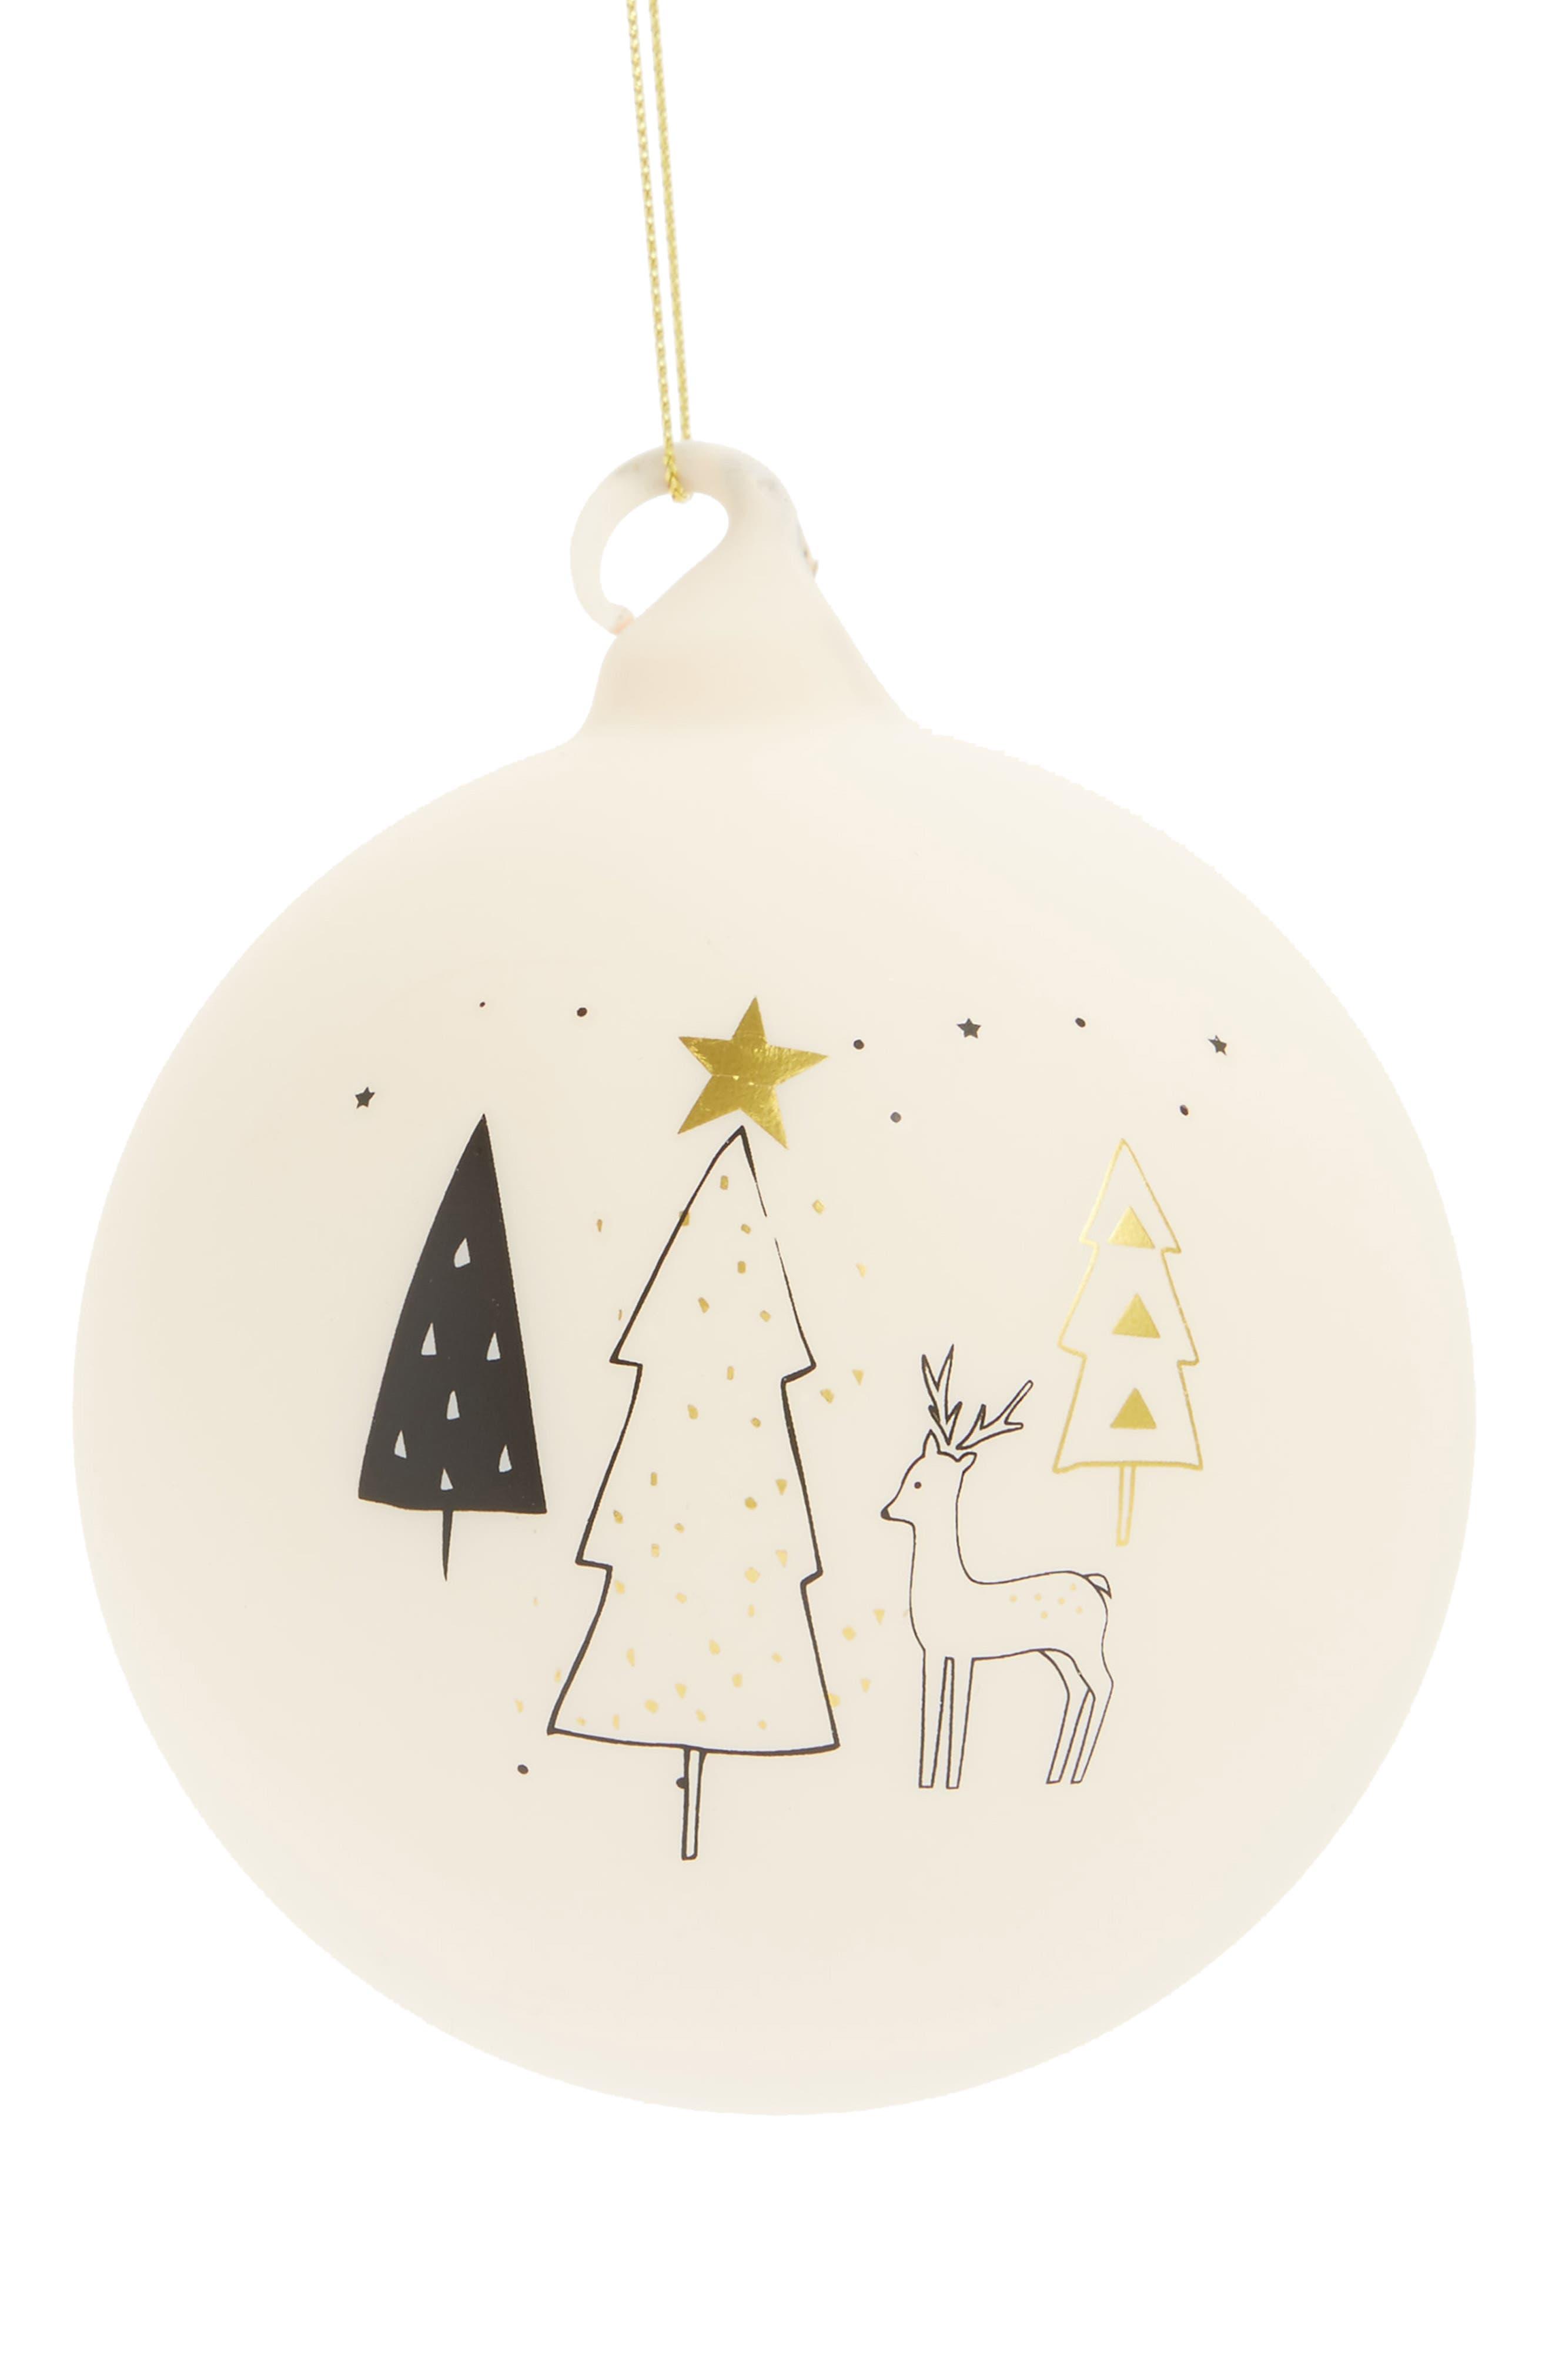 Reindeer Glass Ball Ornament,                             Main thumbnail 1, color,                             900